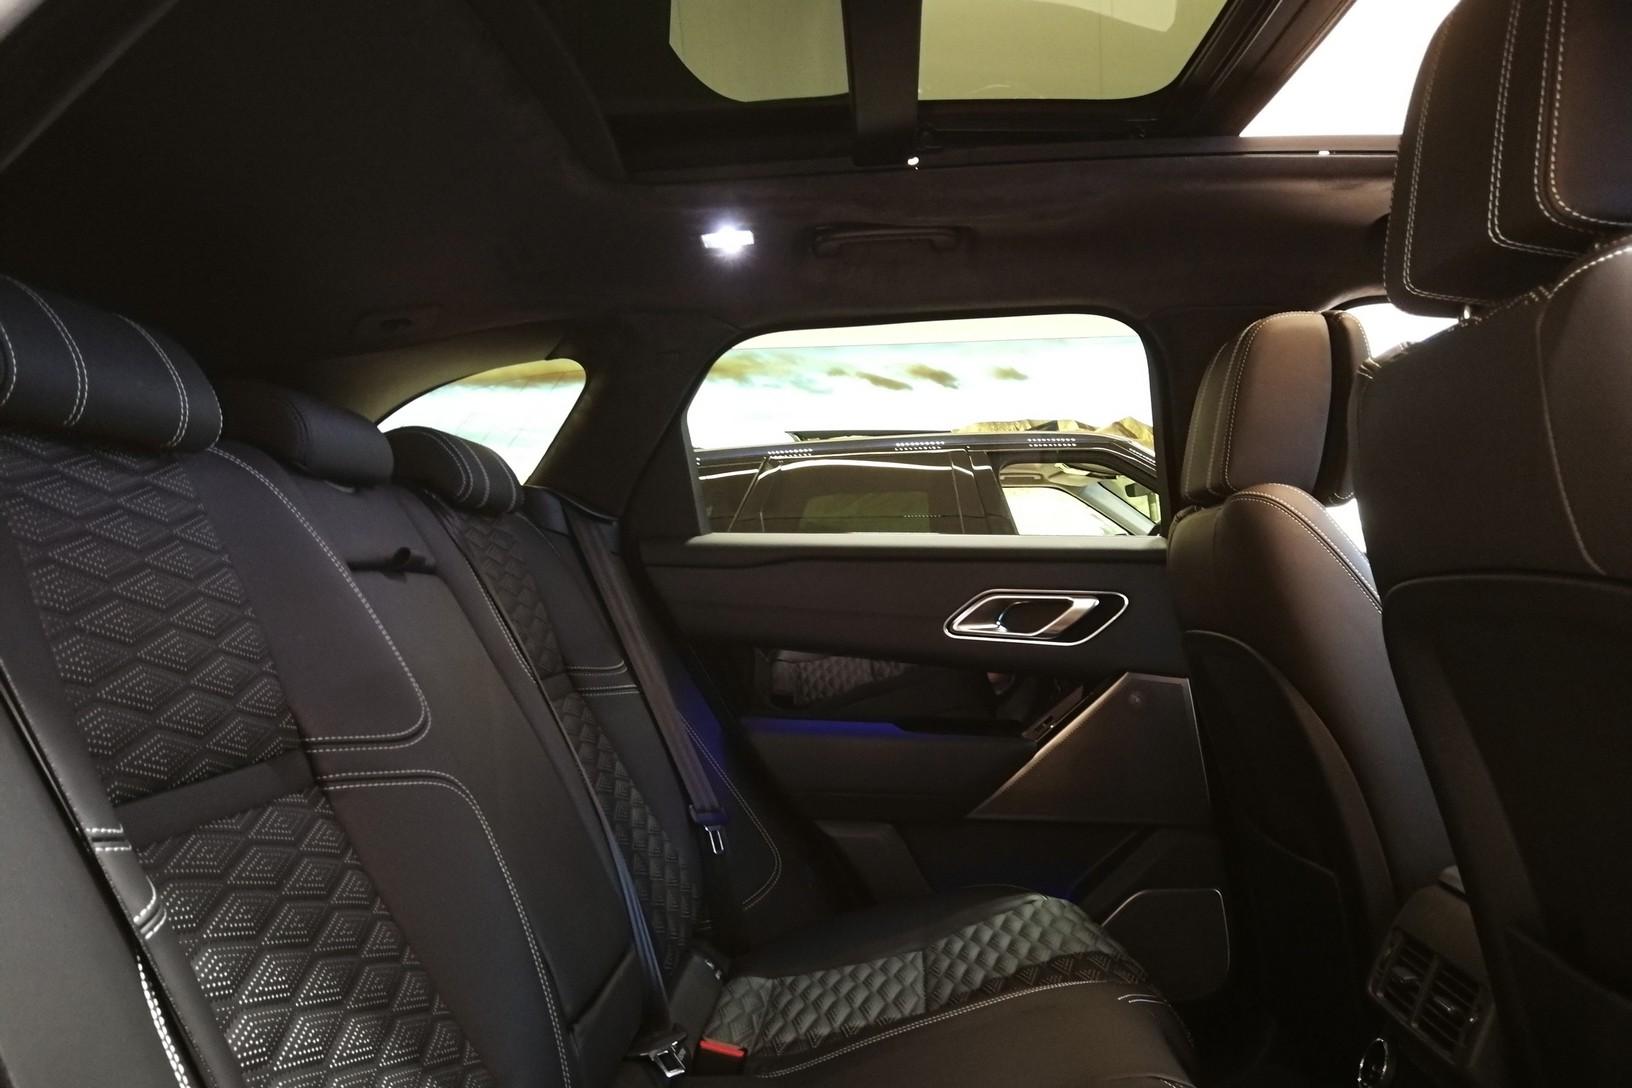 Land Rover Range Rover Velar 5.0 P550 SVAutobiography Dynamic Edition 5dr Auto image 21